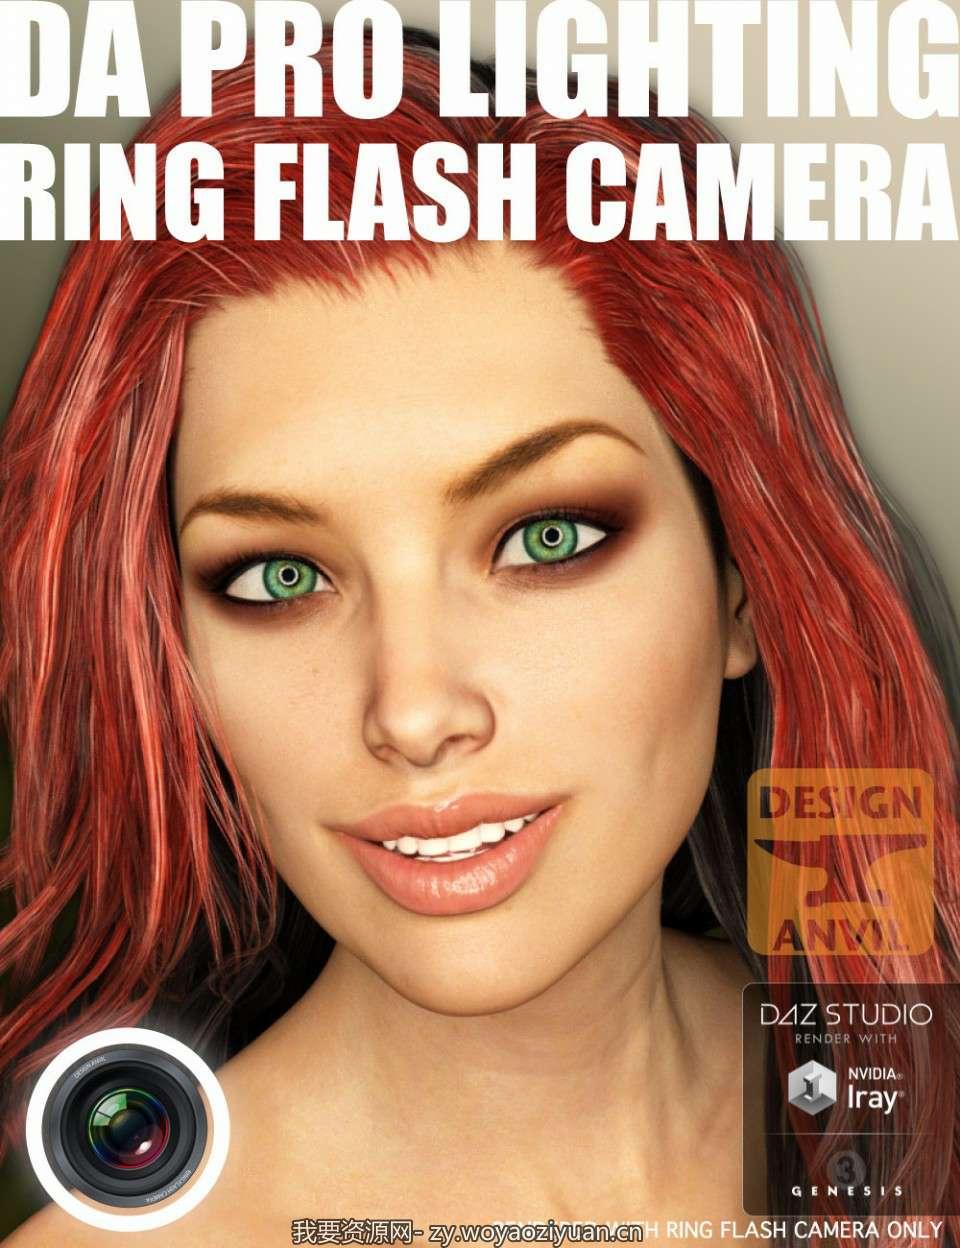 DA Ring Flash Camera